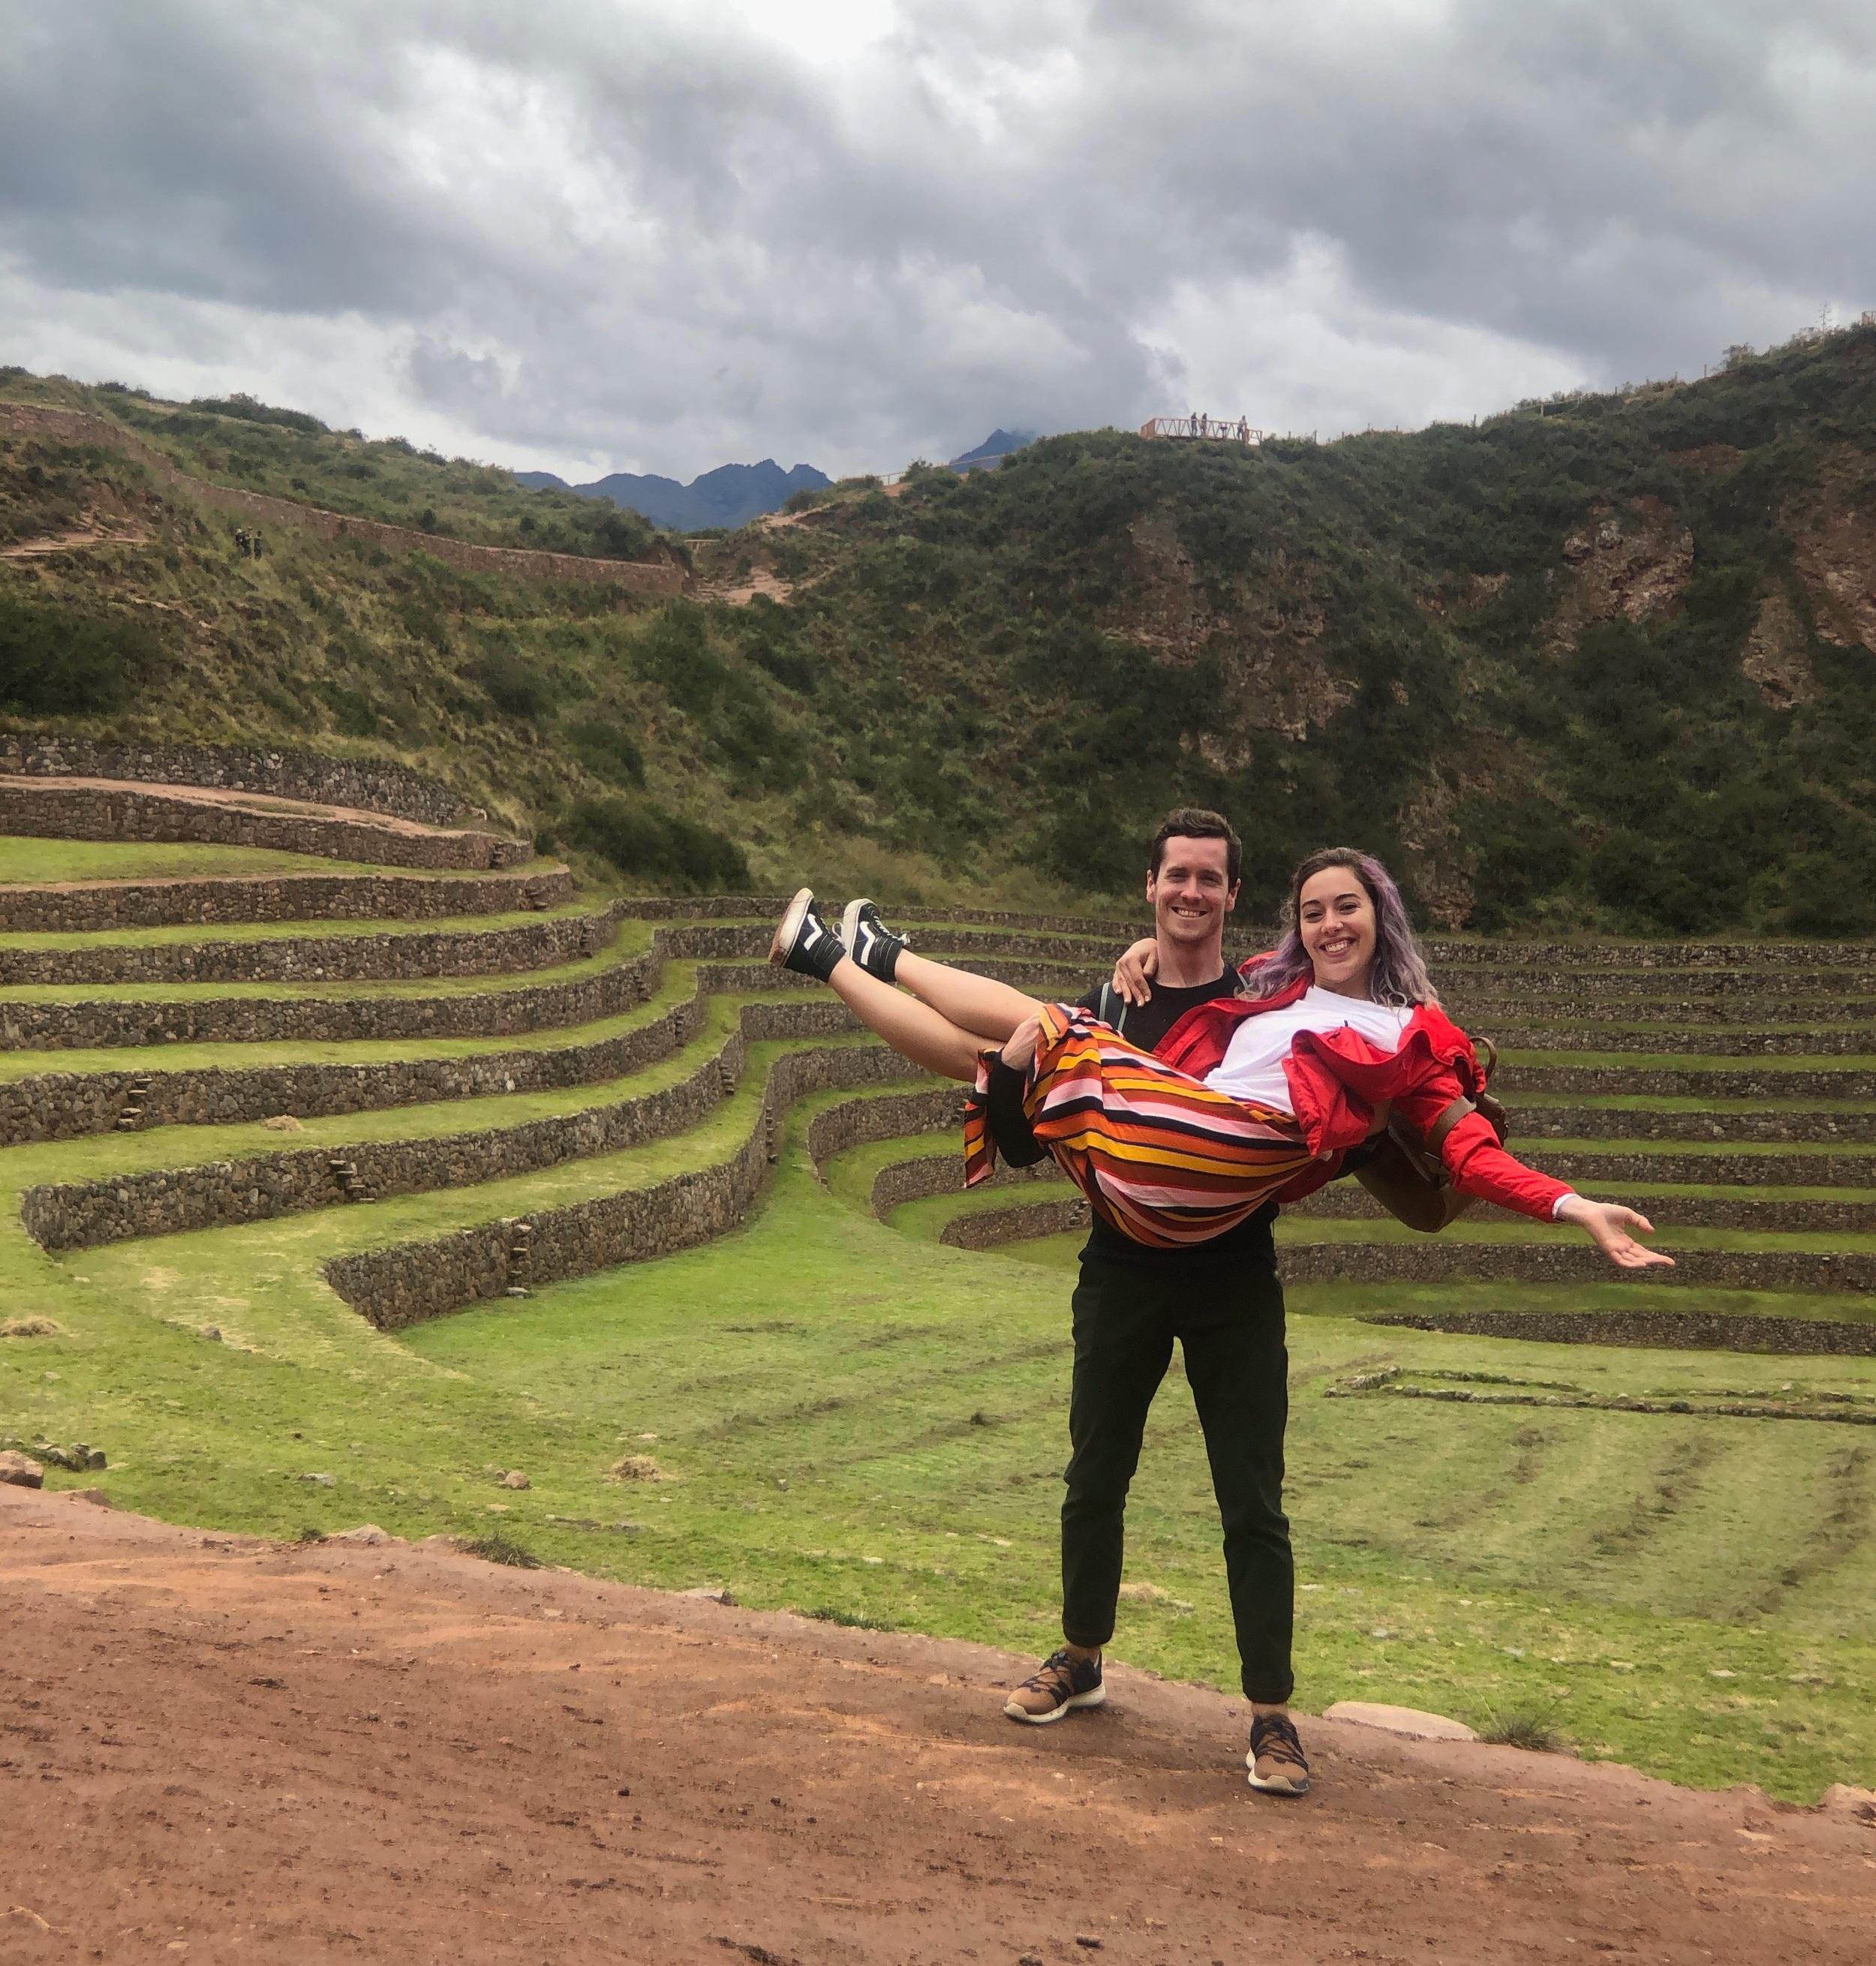 Moray-ruins-sacred+valley-inca-peru-south-america-itinerary-travel+tips-2